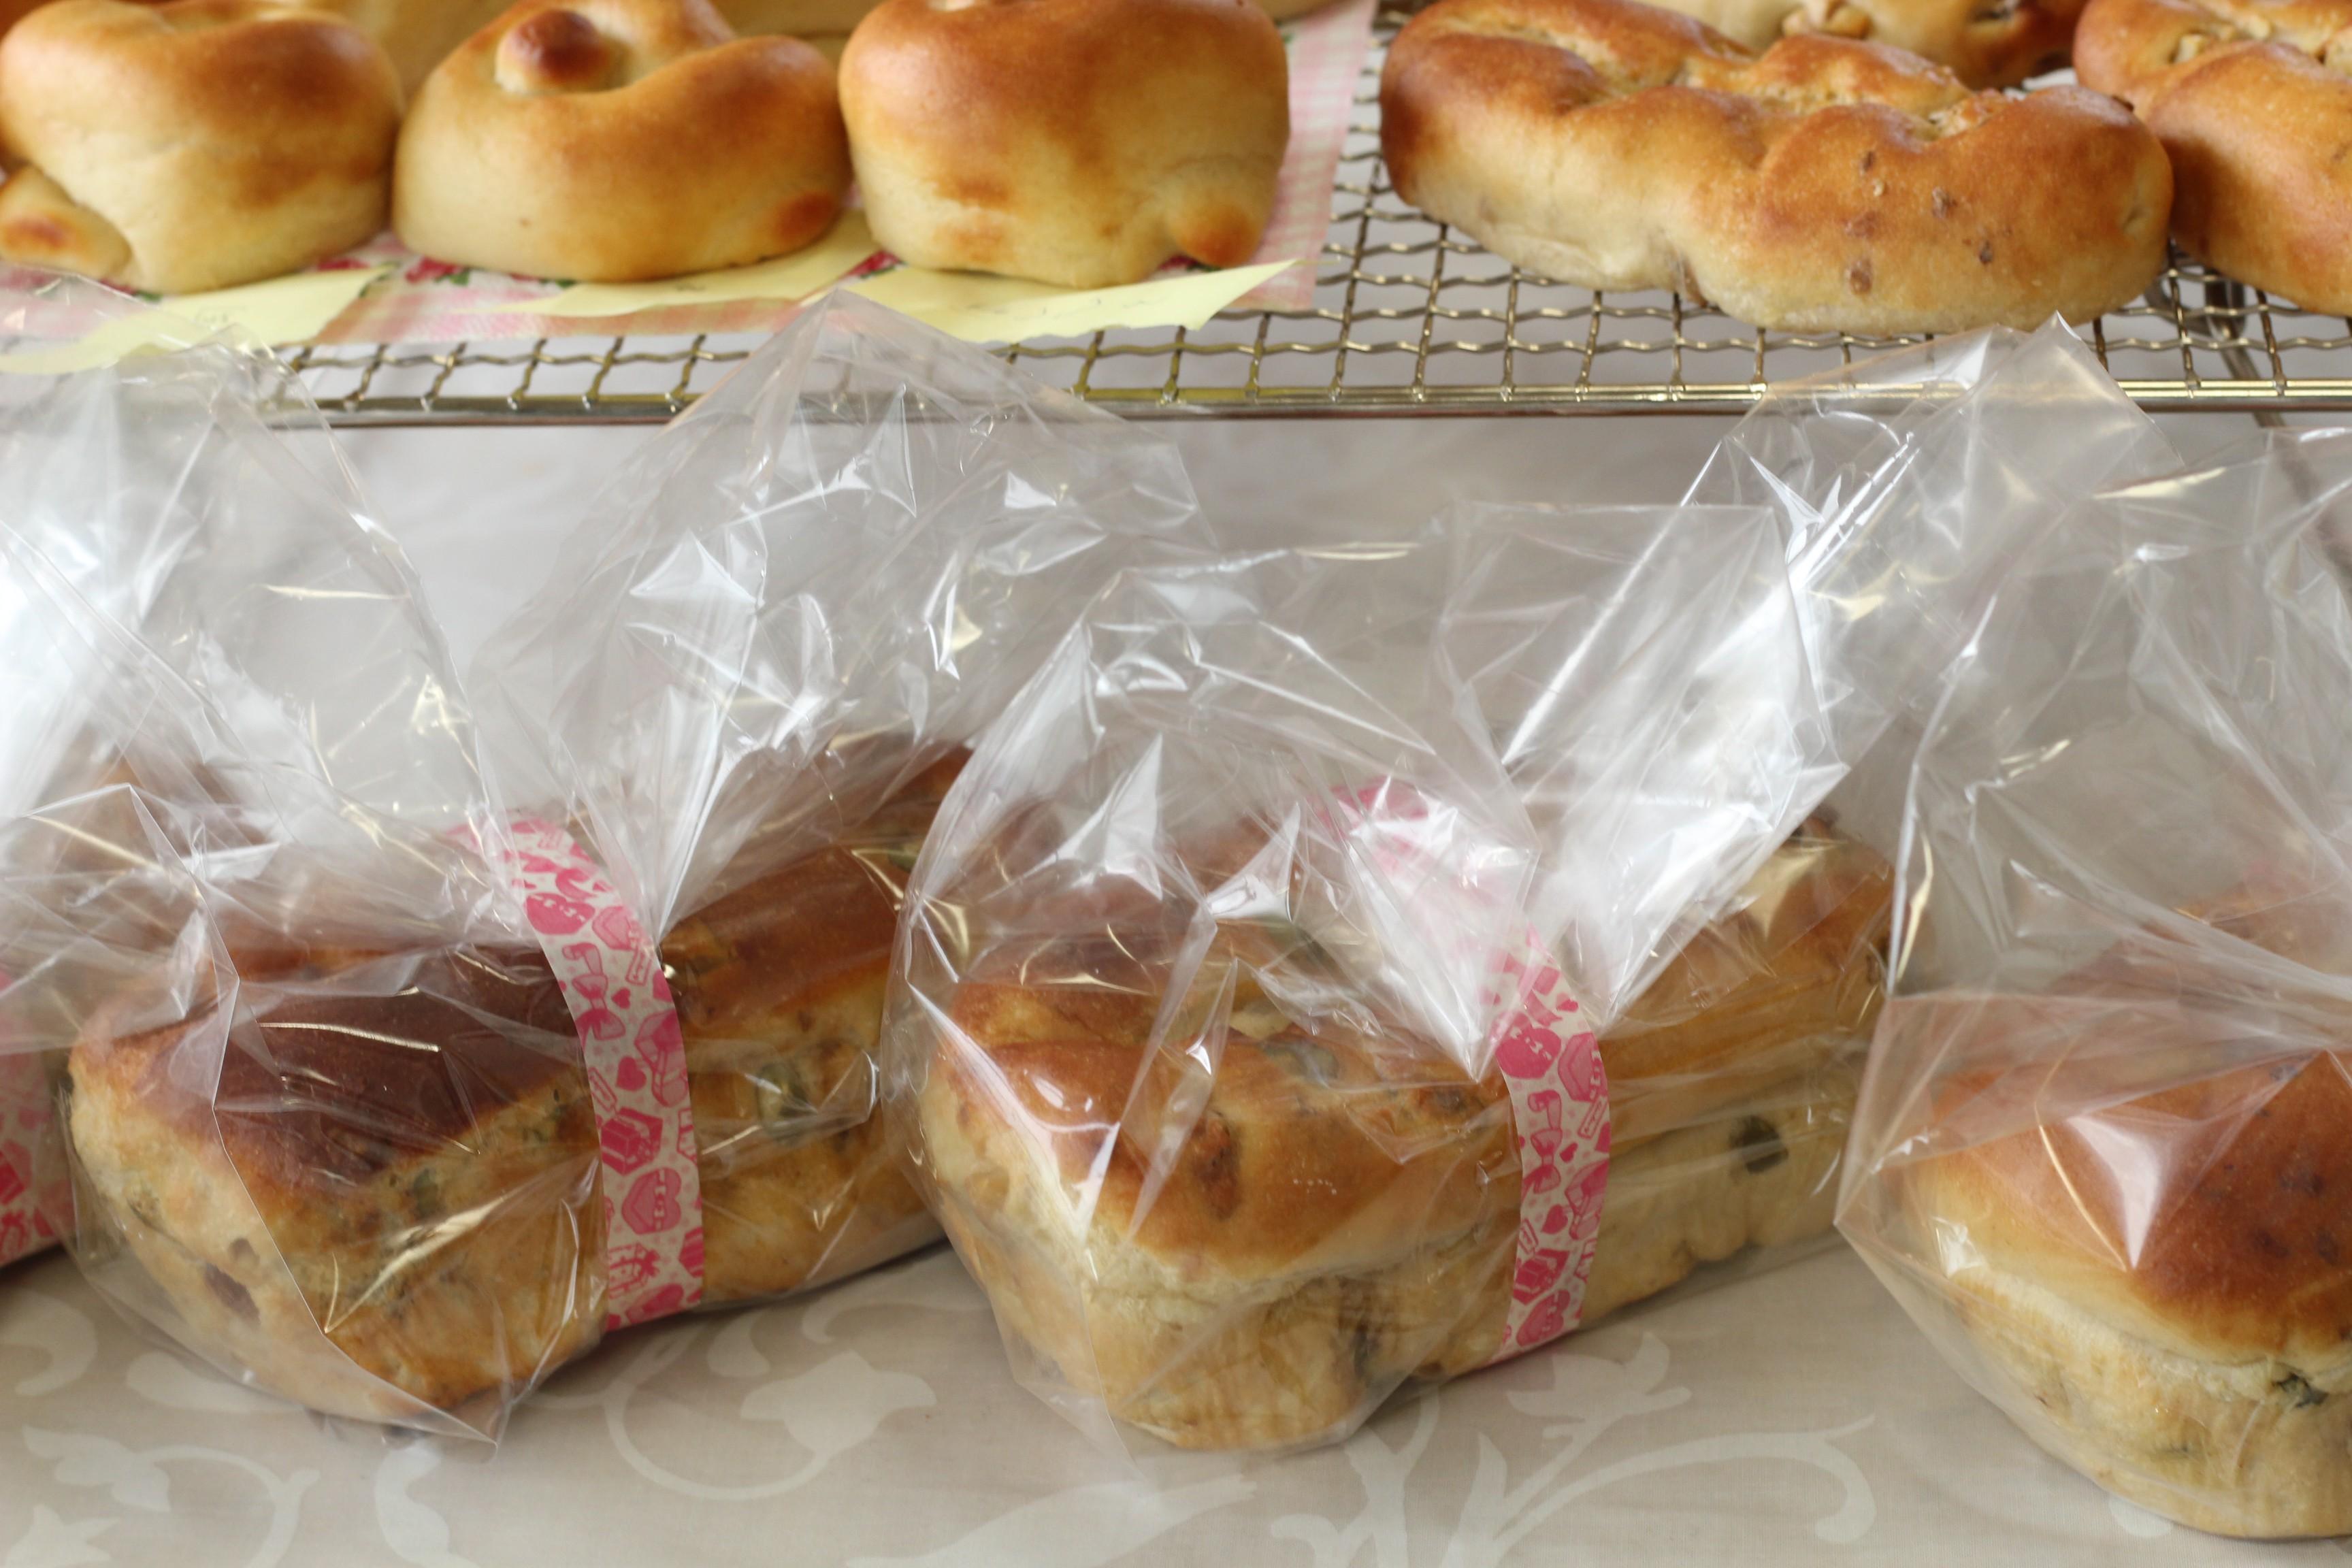 京都江部粉・糖質制限パン